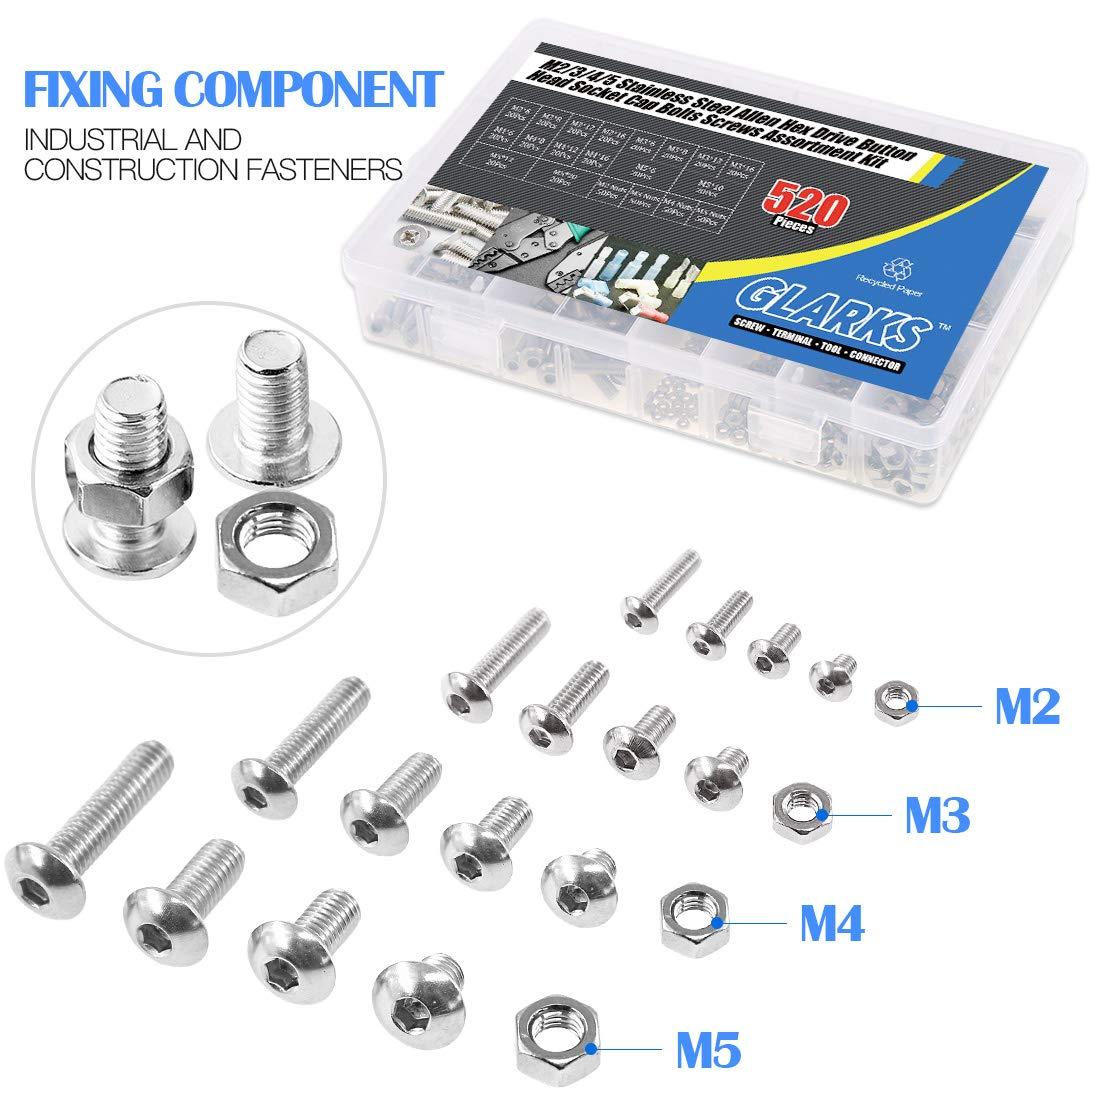 3//4 5 Stainless Steel Allen Hex Drive Button Head Socket Cap Bolts Screws Assortment Kit Glarks 520Pcs M2